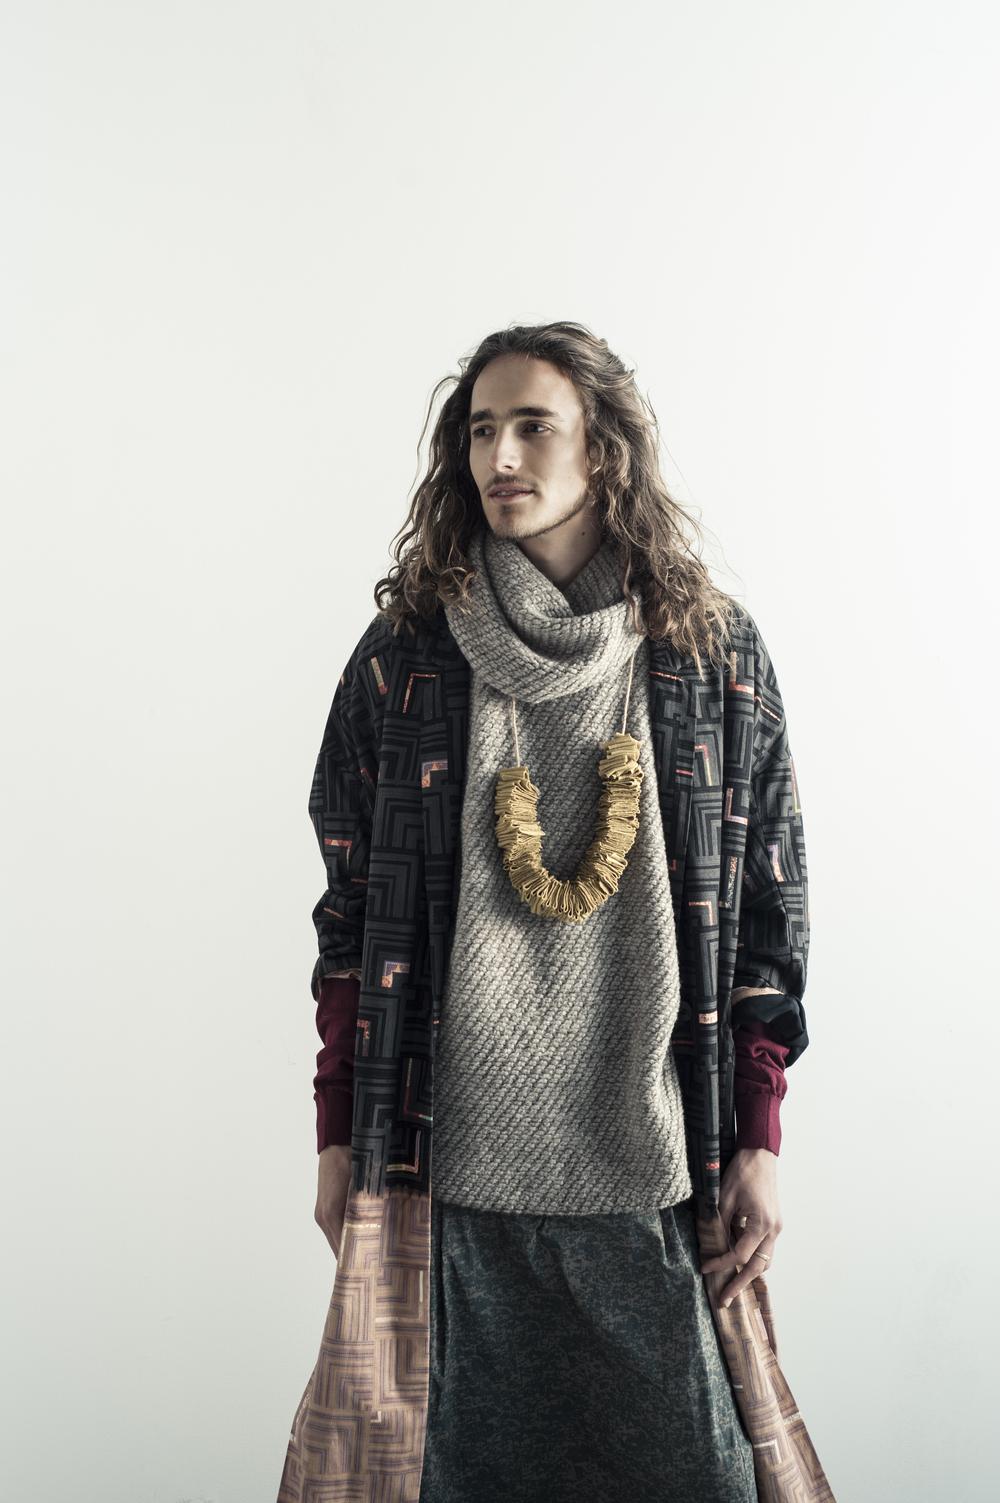 Coat by Gwen Shihyao Lai, MFA Fashion Design. Pants by Ryan Mora, BFA Fashion Design and Melissa Avalos, BFA Textile Design. Sweater by Elizabeth Castellon, MFA Fashion Design. Necklace made from UNIQLO sweater.